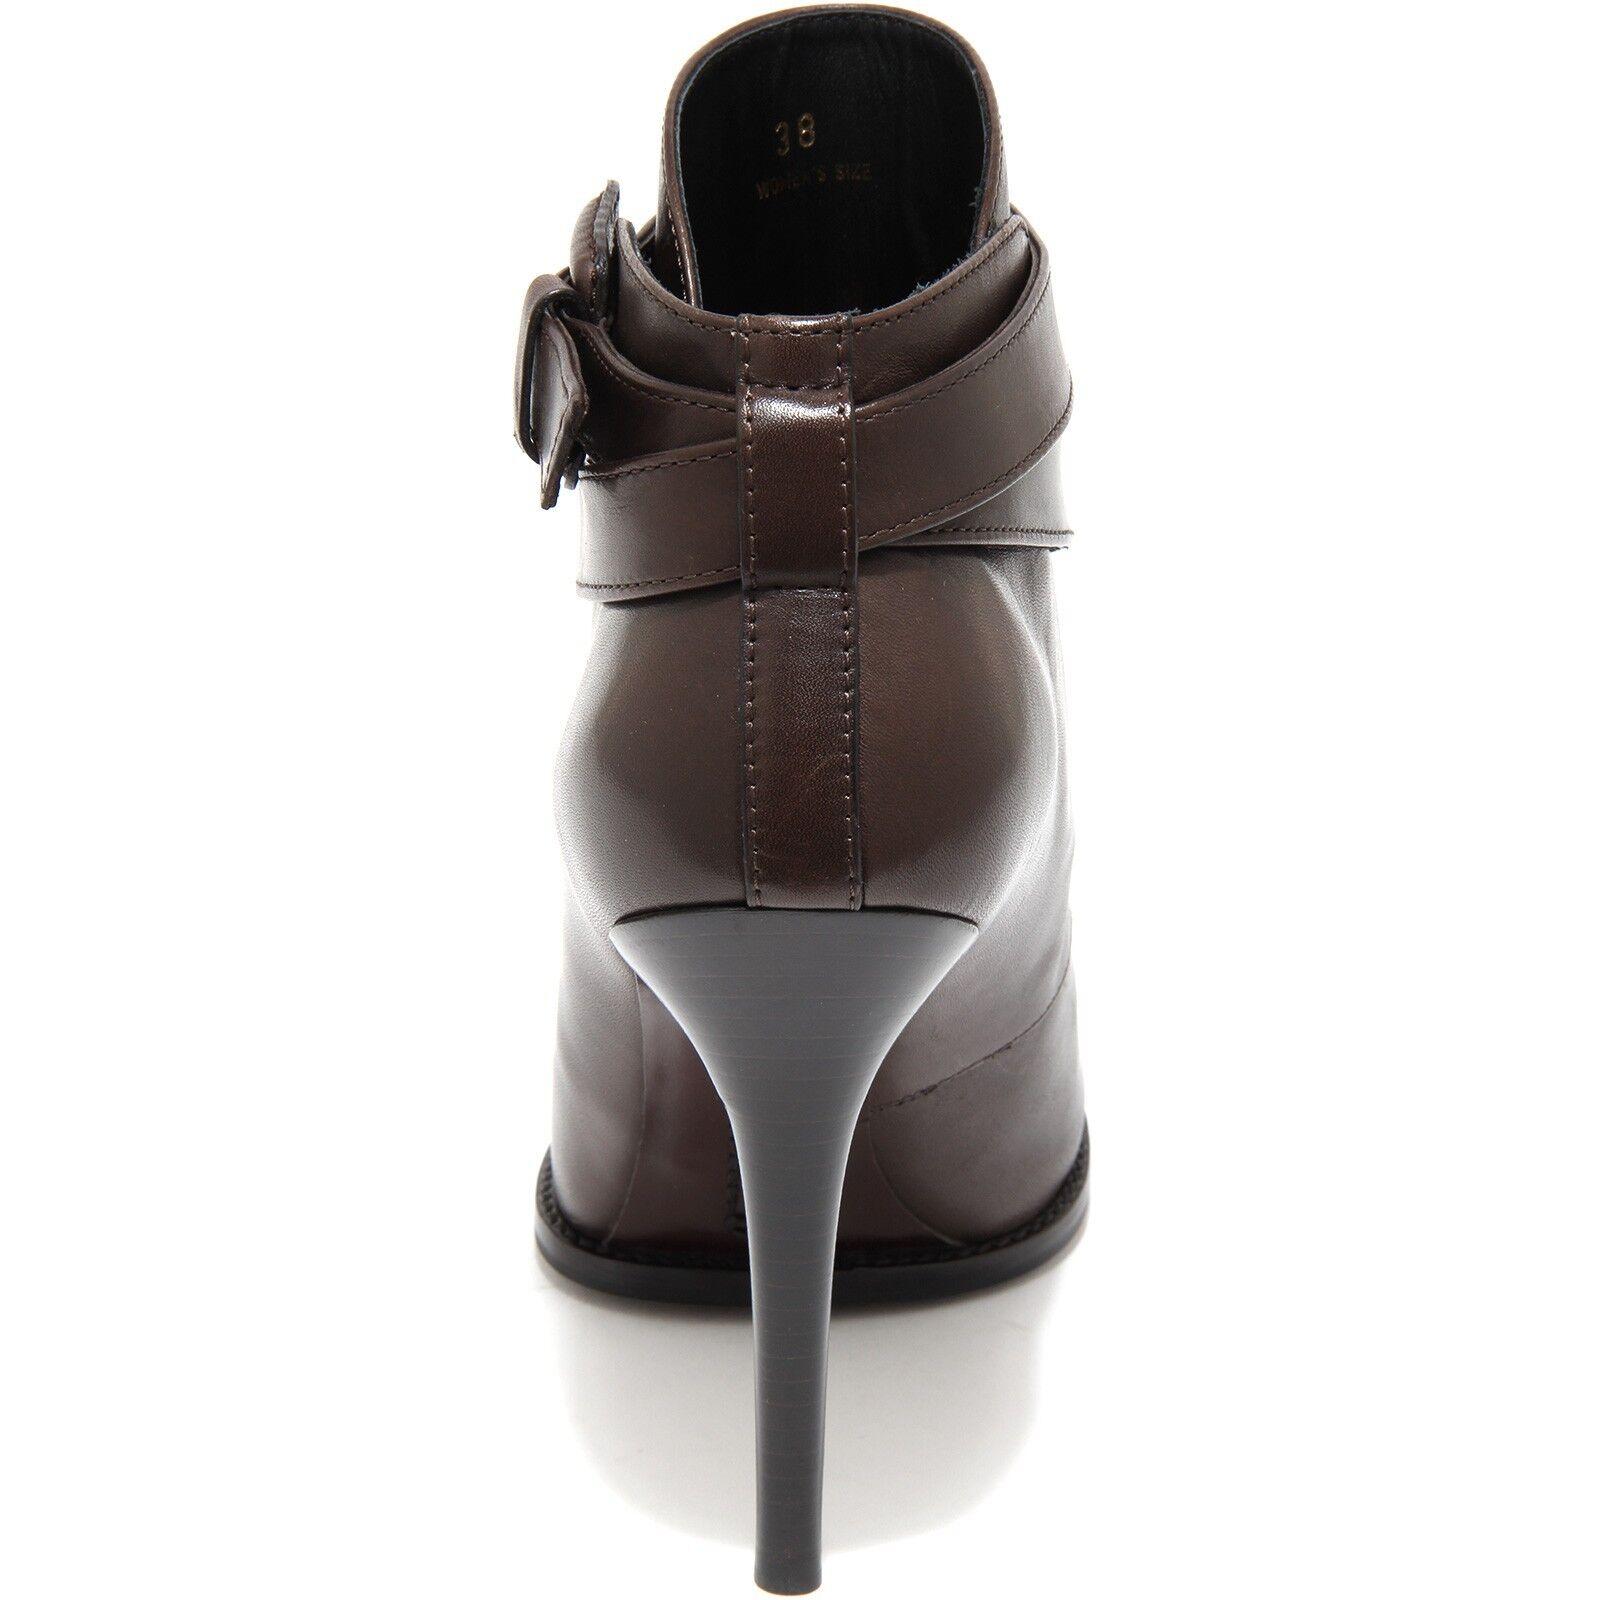 80467 tronchetto Tod's Gomma t110 si Fibbia Fibbia Fibbia Scarpa Stivale mujer botas zapatos Wom 81f4f5